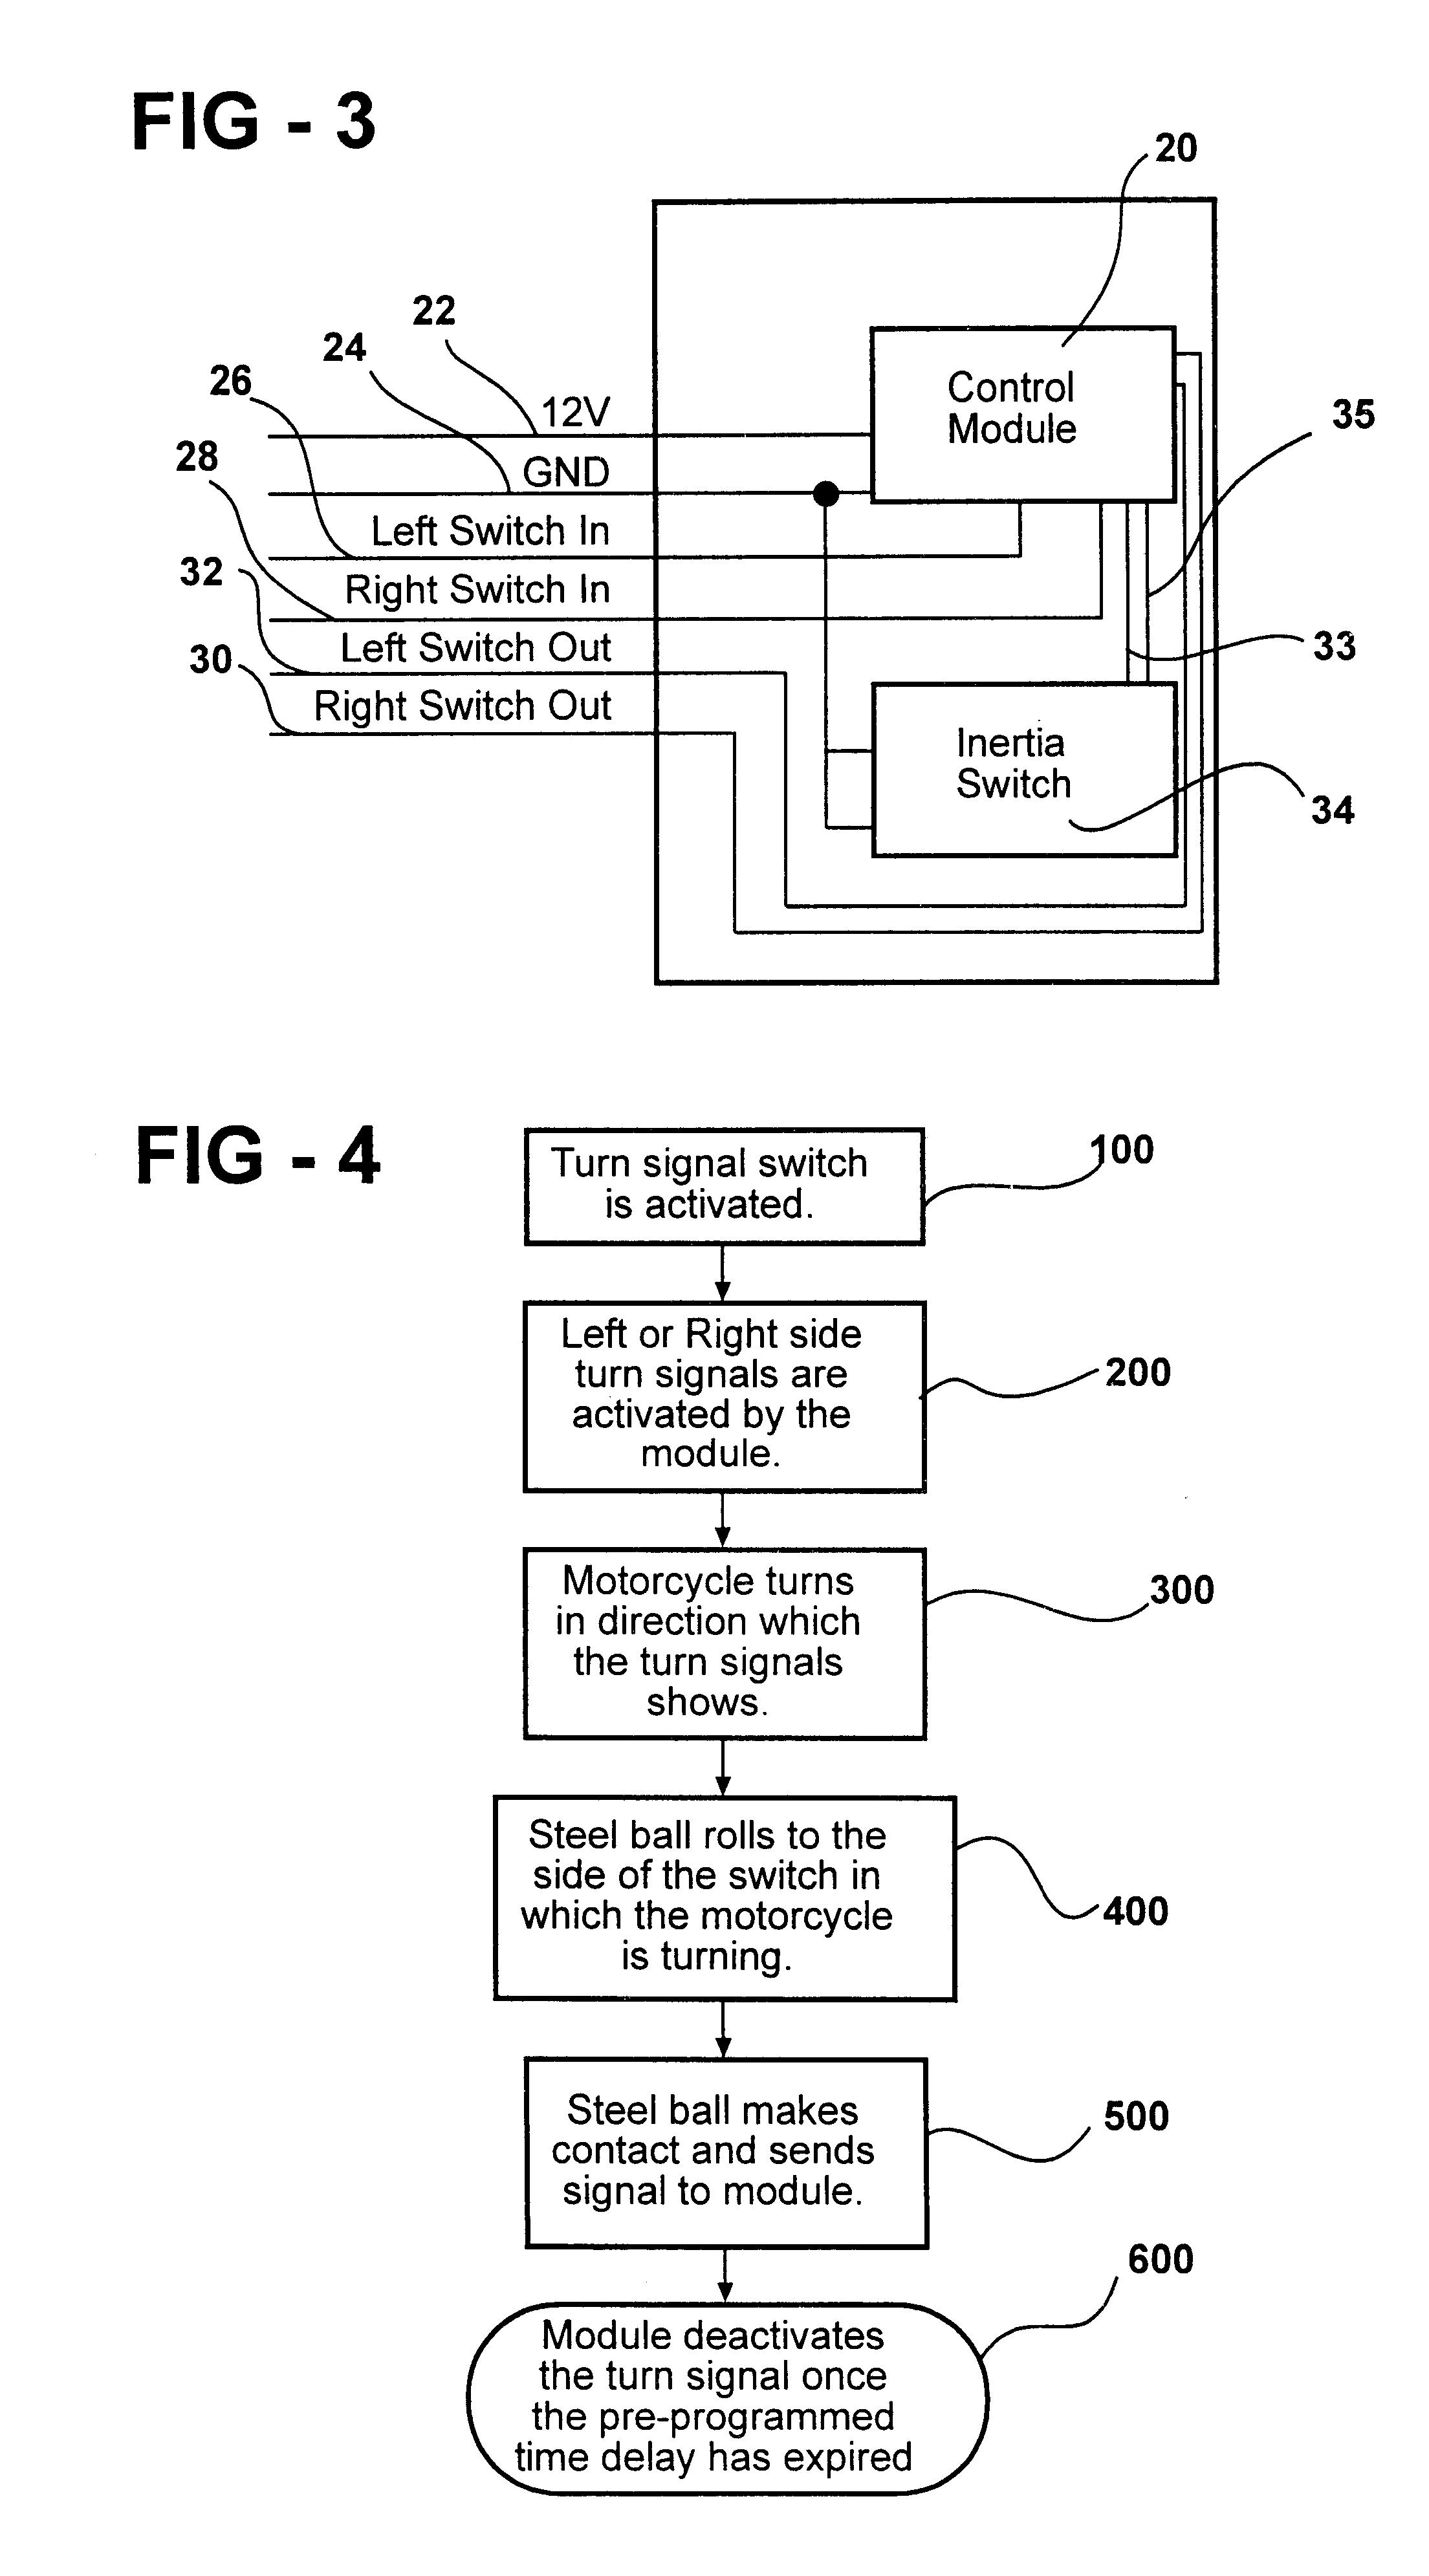 Badlands Turn Signal Wiring Diagram - Trusted Wiring Diagram Online - Badlands Turn Signal Module Wiring Diagram